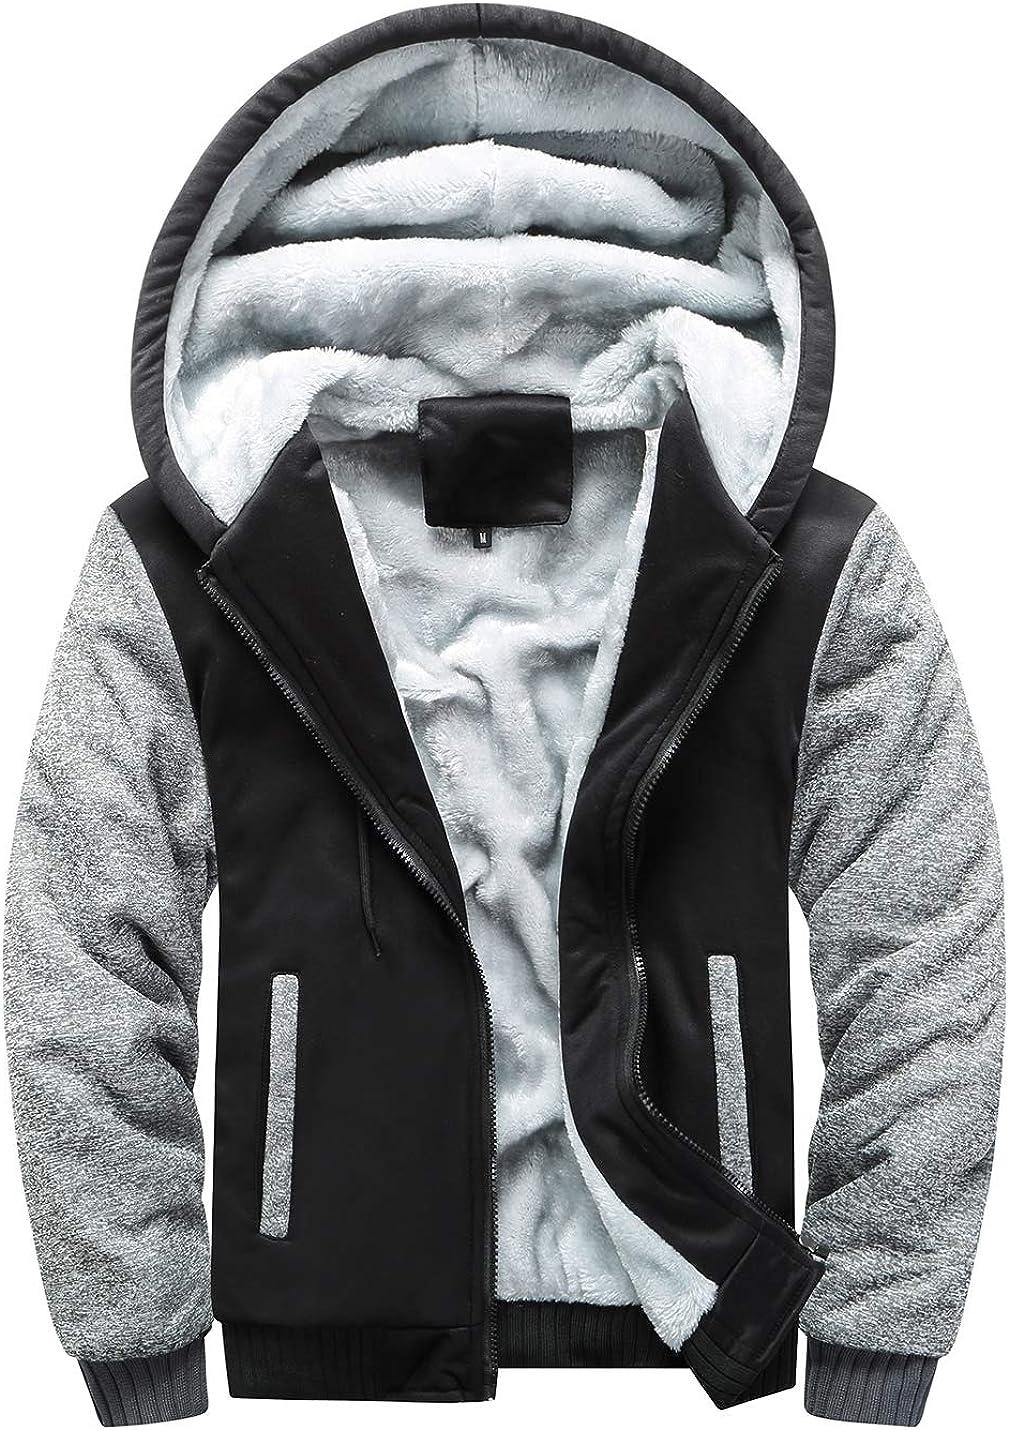 Yeokou Womens Winter Warm Camo Fresno Mall Sweatshirt Sherpa Our shop most popular Thicken H Lined